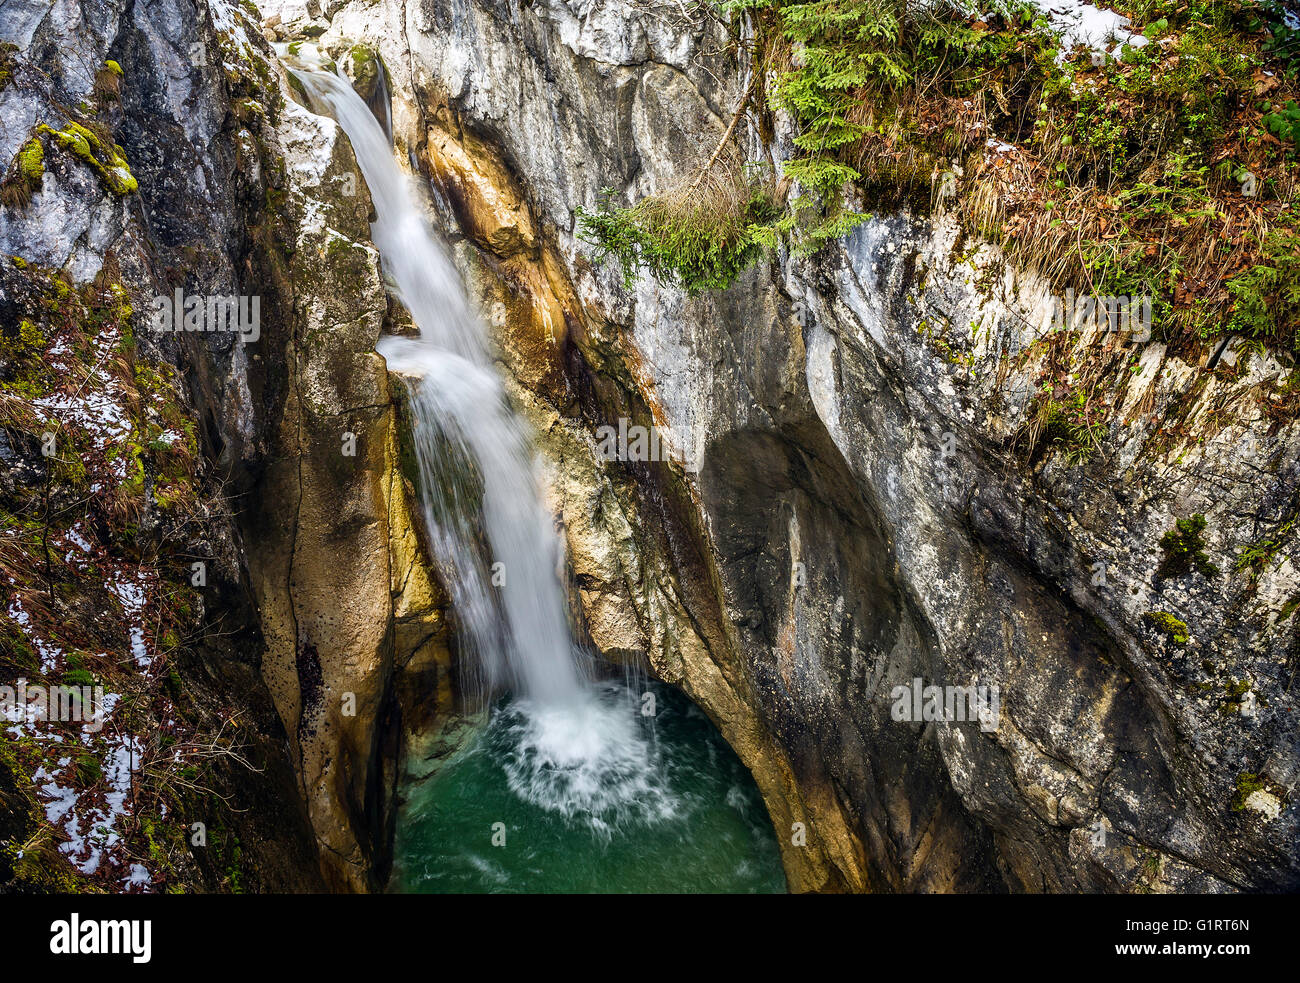 Tatzelwurm waterfall, Upper Level, Mangfall mountains, Oberaudorf, Upper Bavaria, Bavaria, Germany - Stock Image